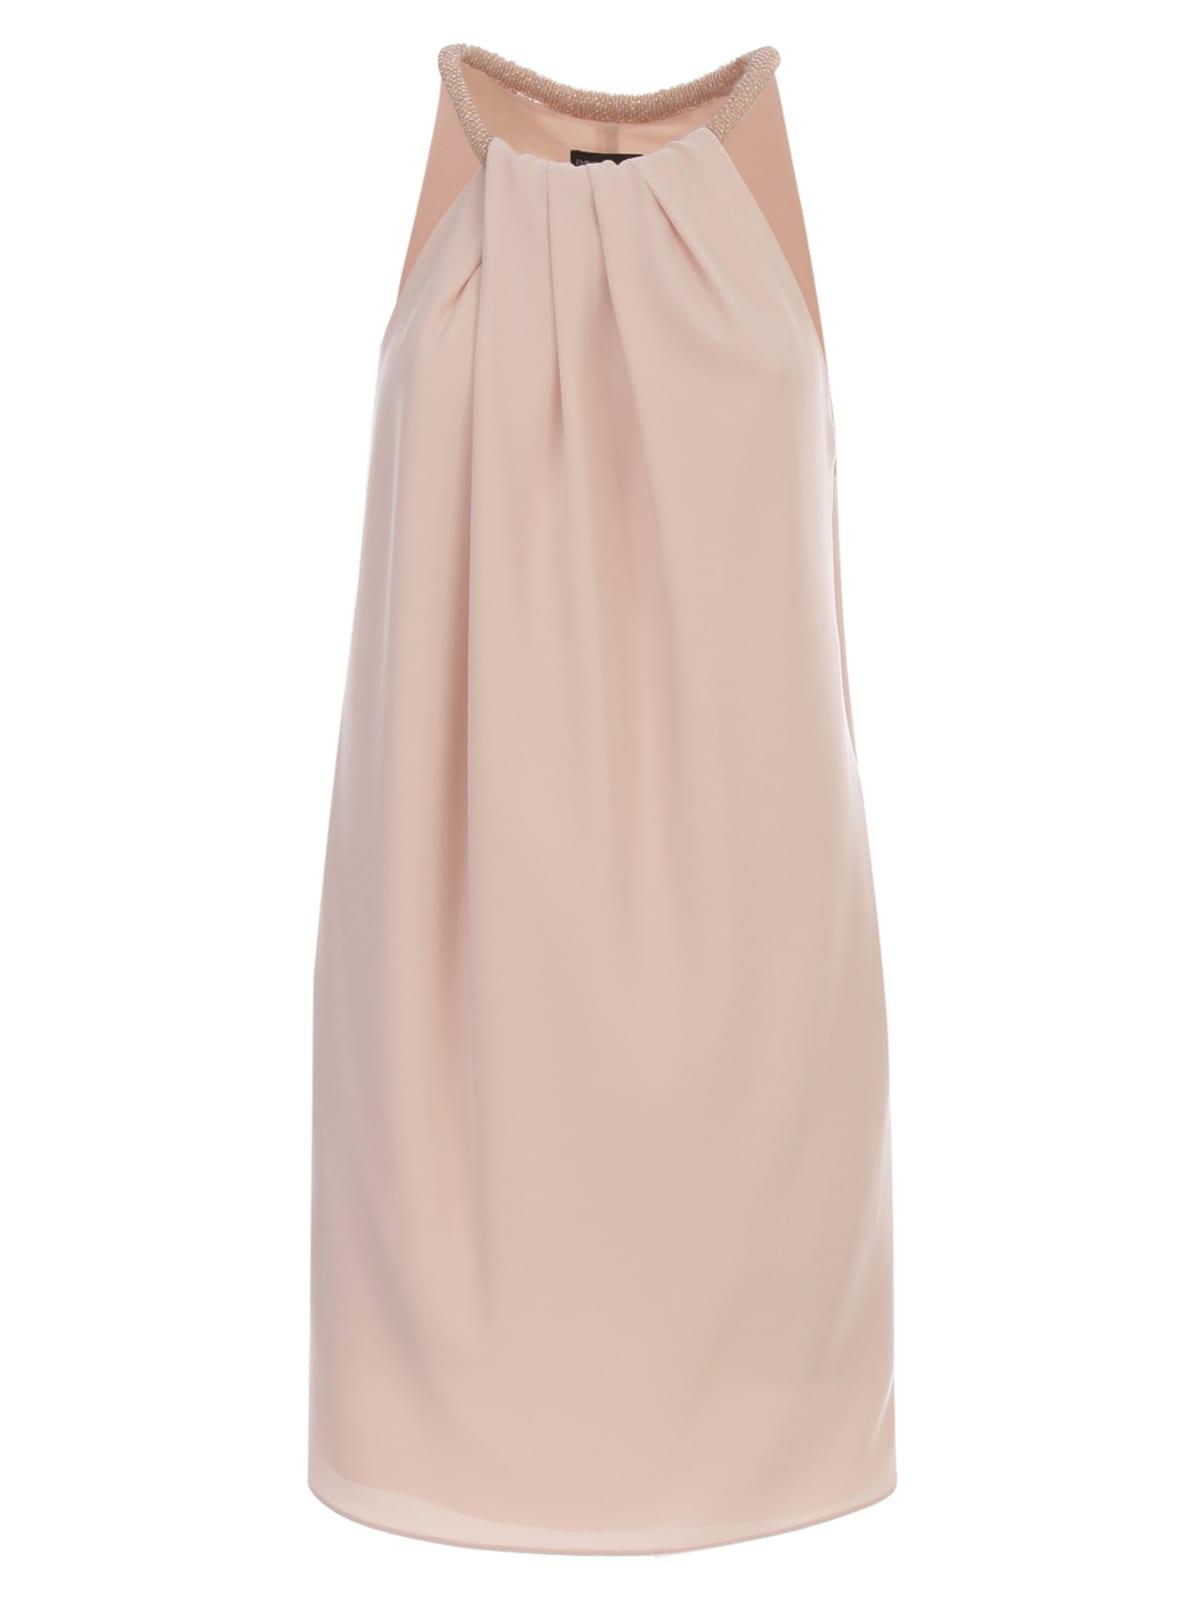 Buy Emporio Armani Dress W/s W/pearls Necklace online, shop Emporio Armani with free shipping